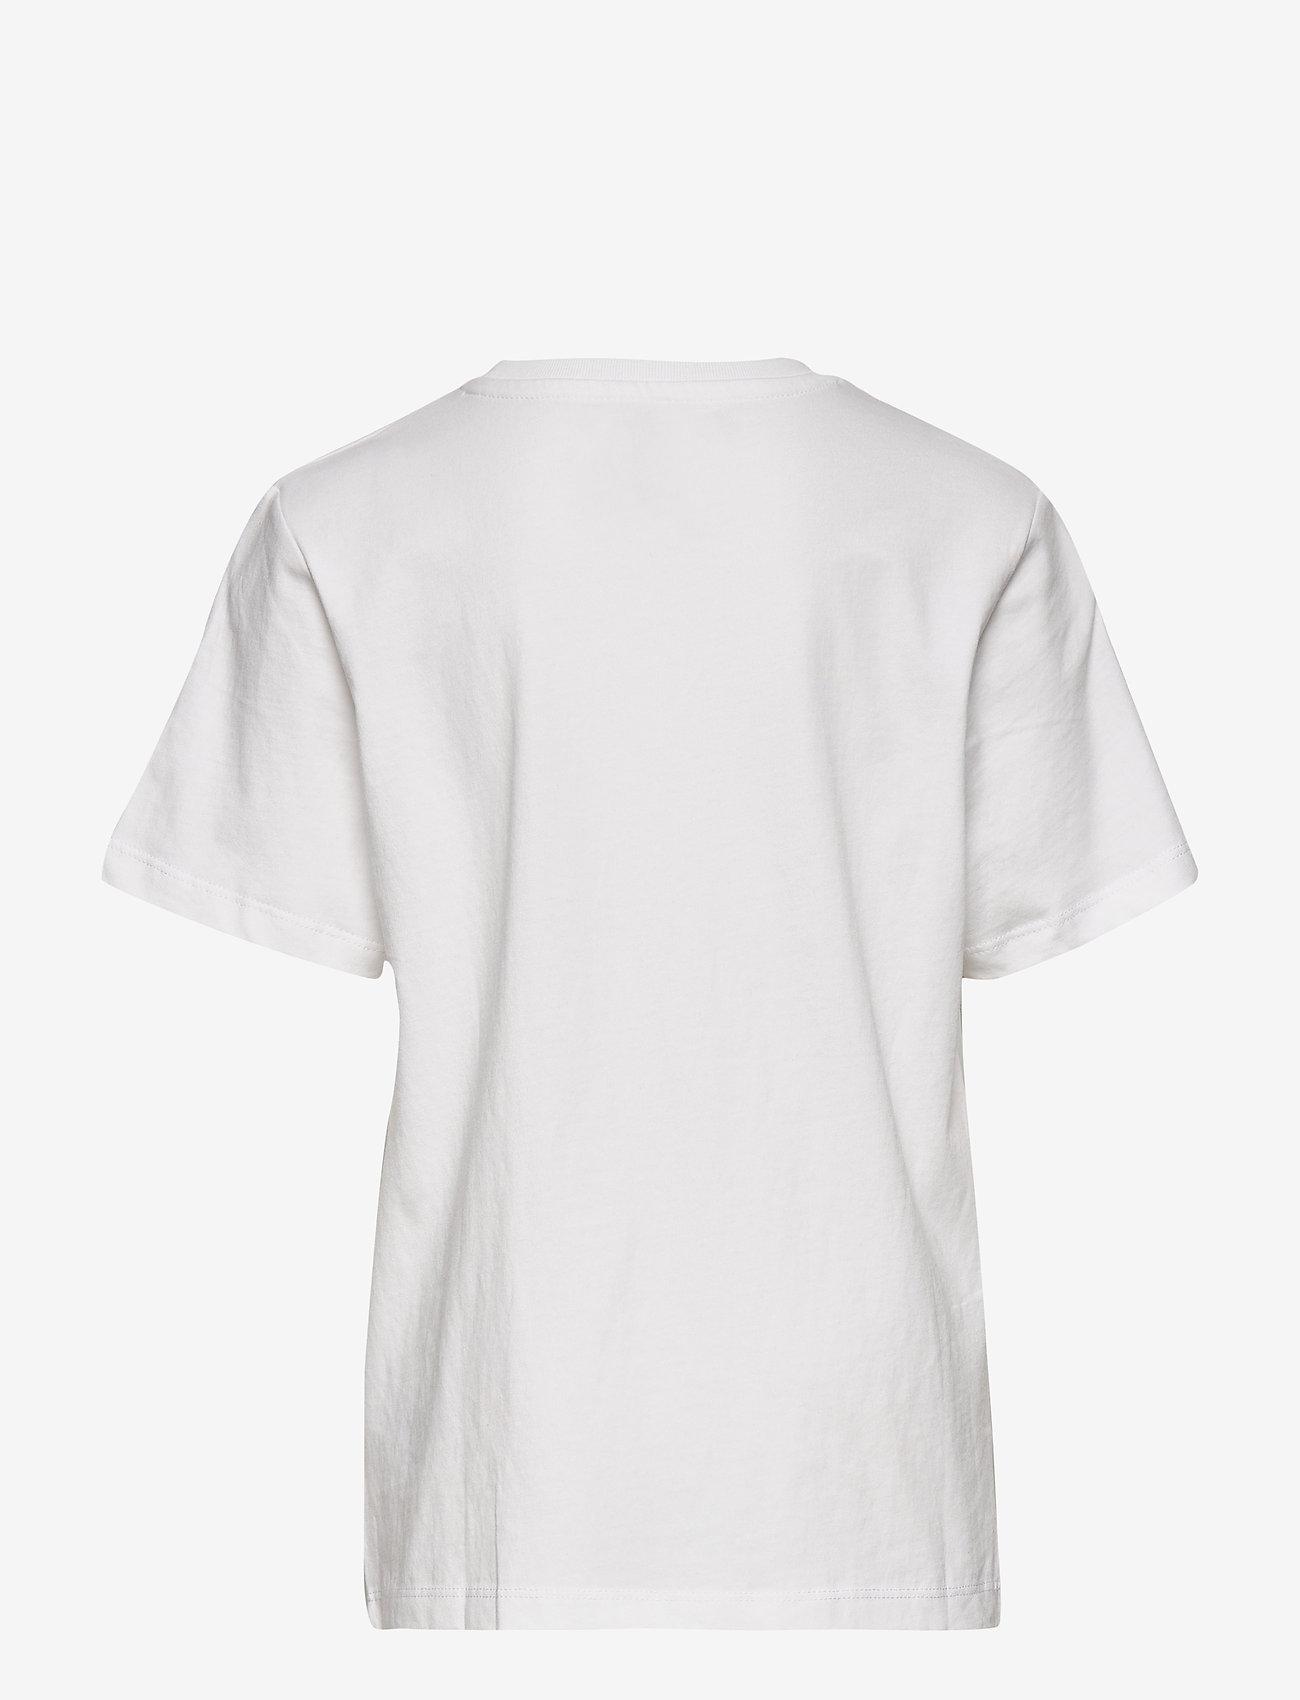 Calvin Klein - MONOGRAM LOGO T-SHIRT - t-shirts - bright white - 1